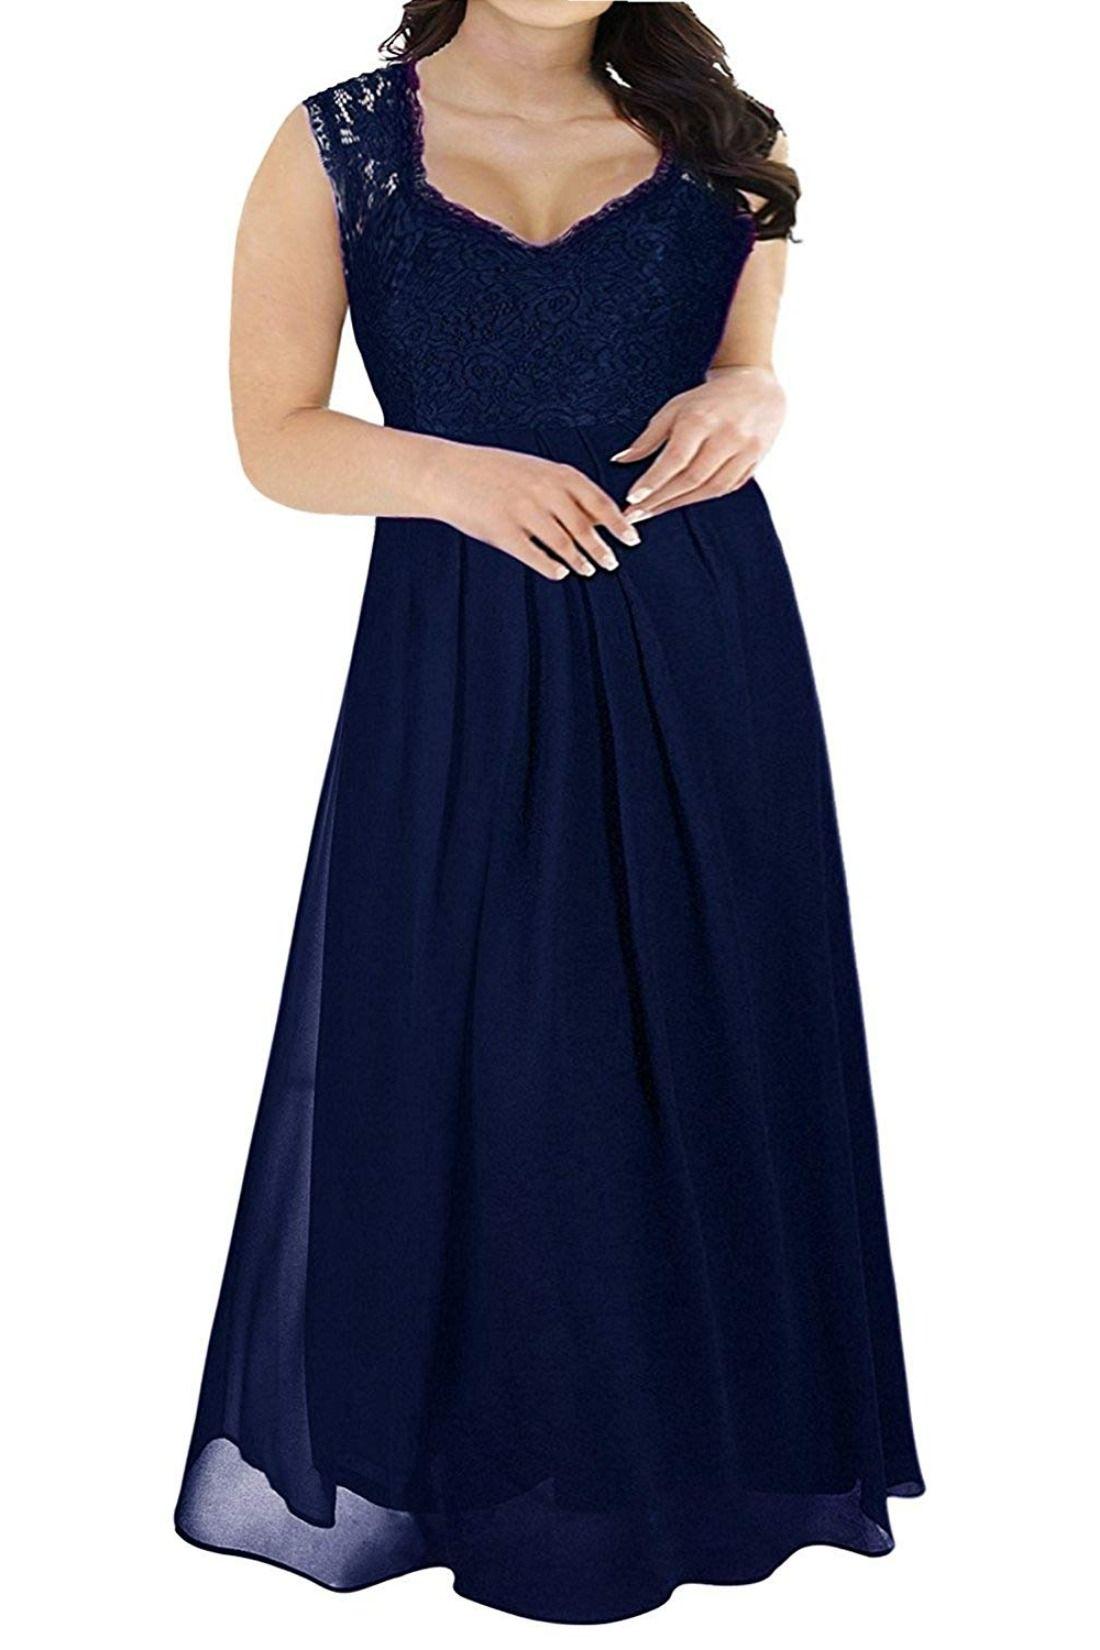 c730ba5921a Nemidor Women s Deep- V Neck Sleeveless Vintage Plus Size Bridesmaid Formal  Maxi Dress 4.1 out of 5 stars 179 customer reviews Price   29.99 -  39.99